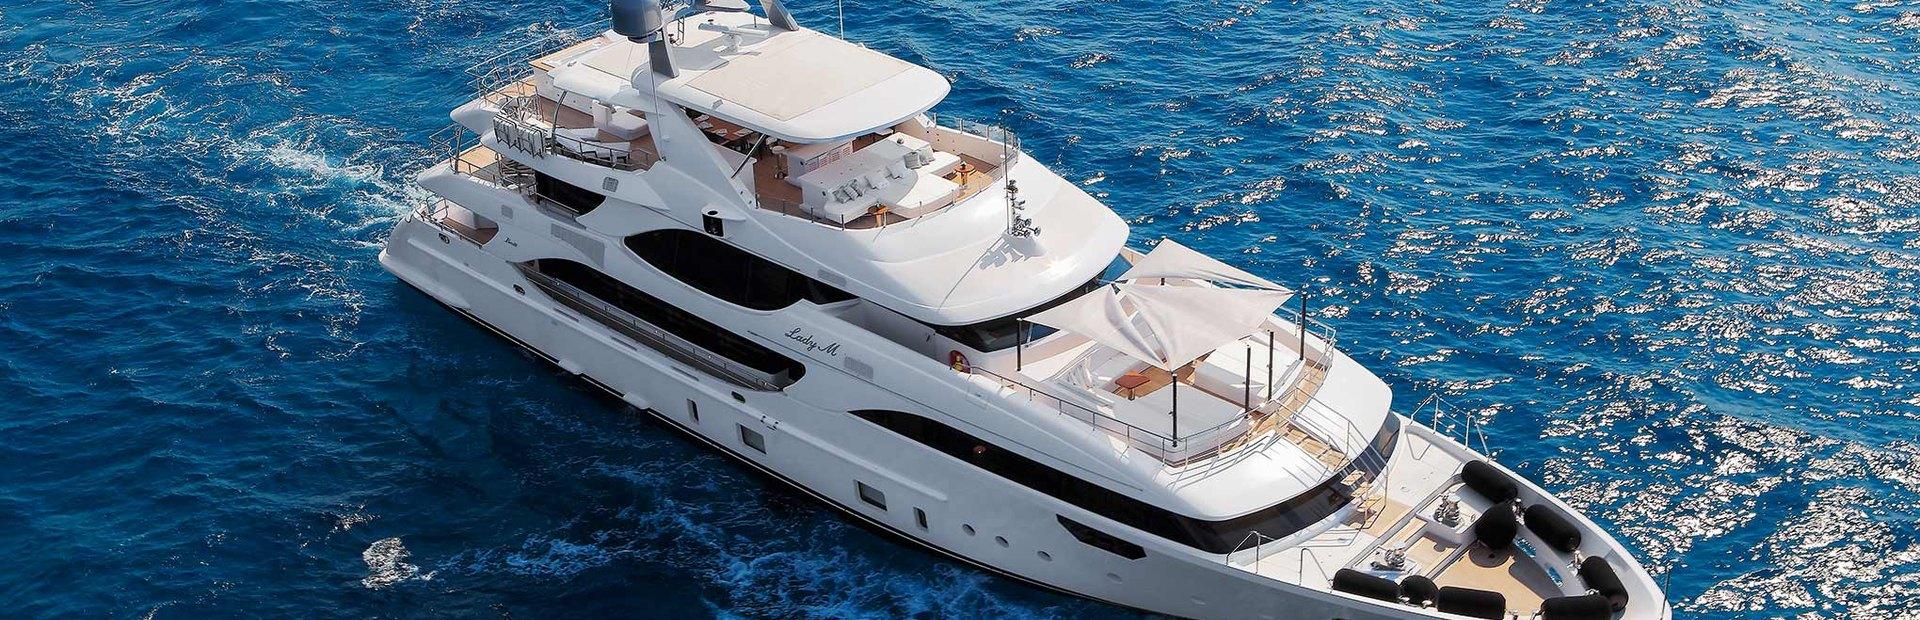 Crystal 140' Yacht Charter